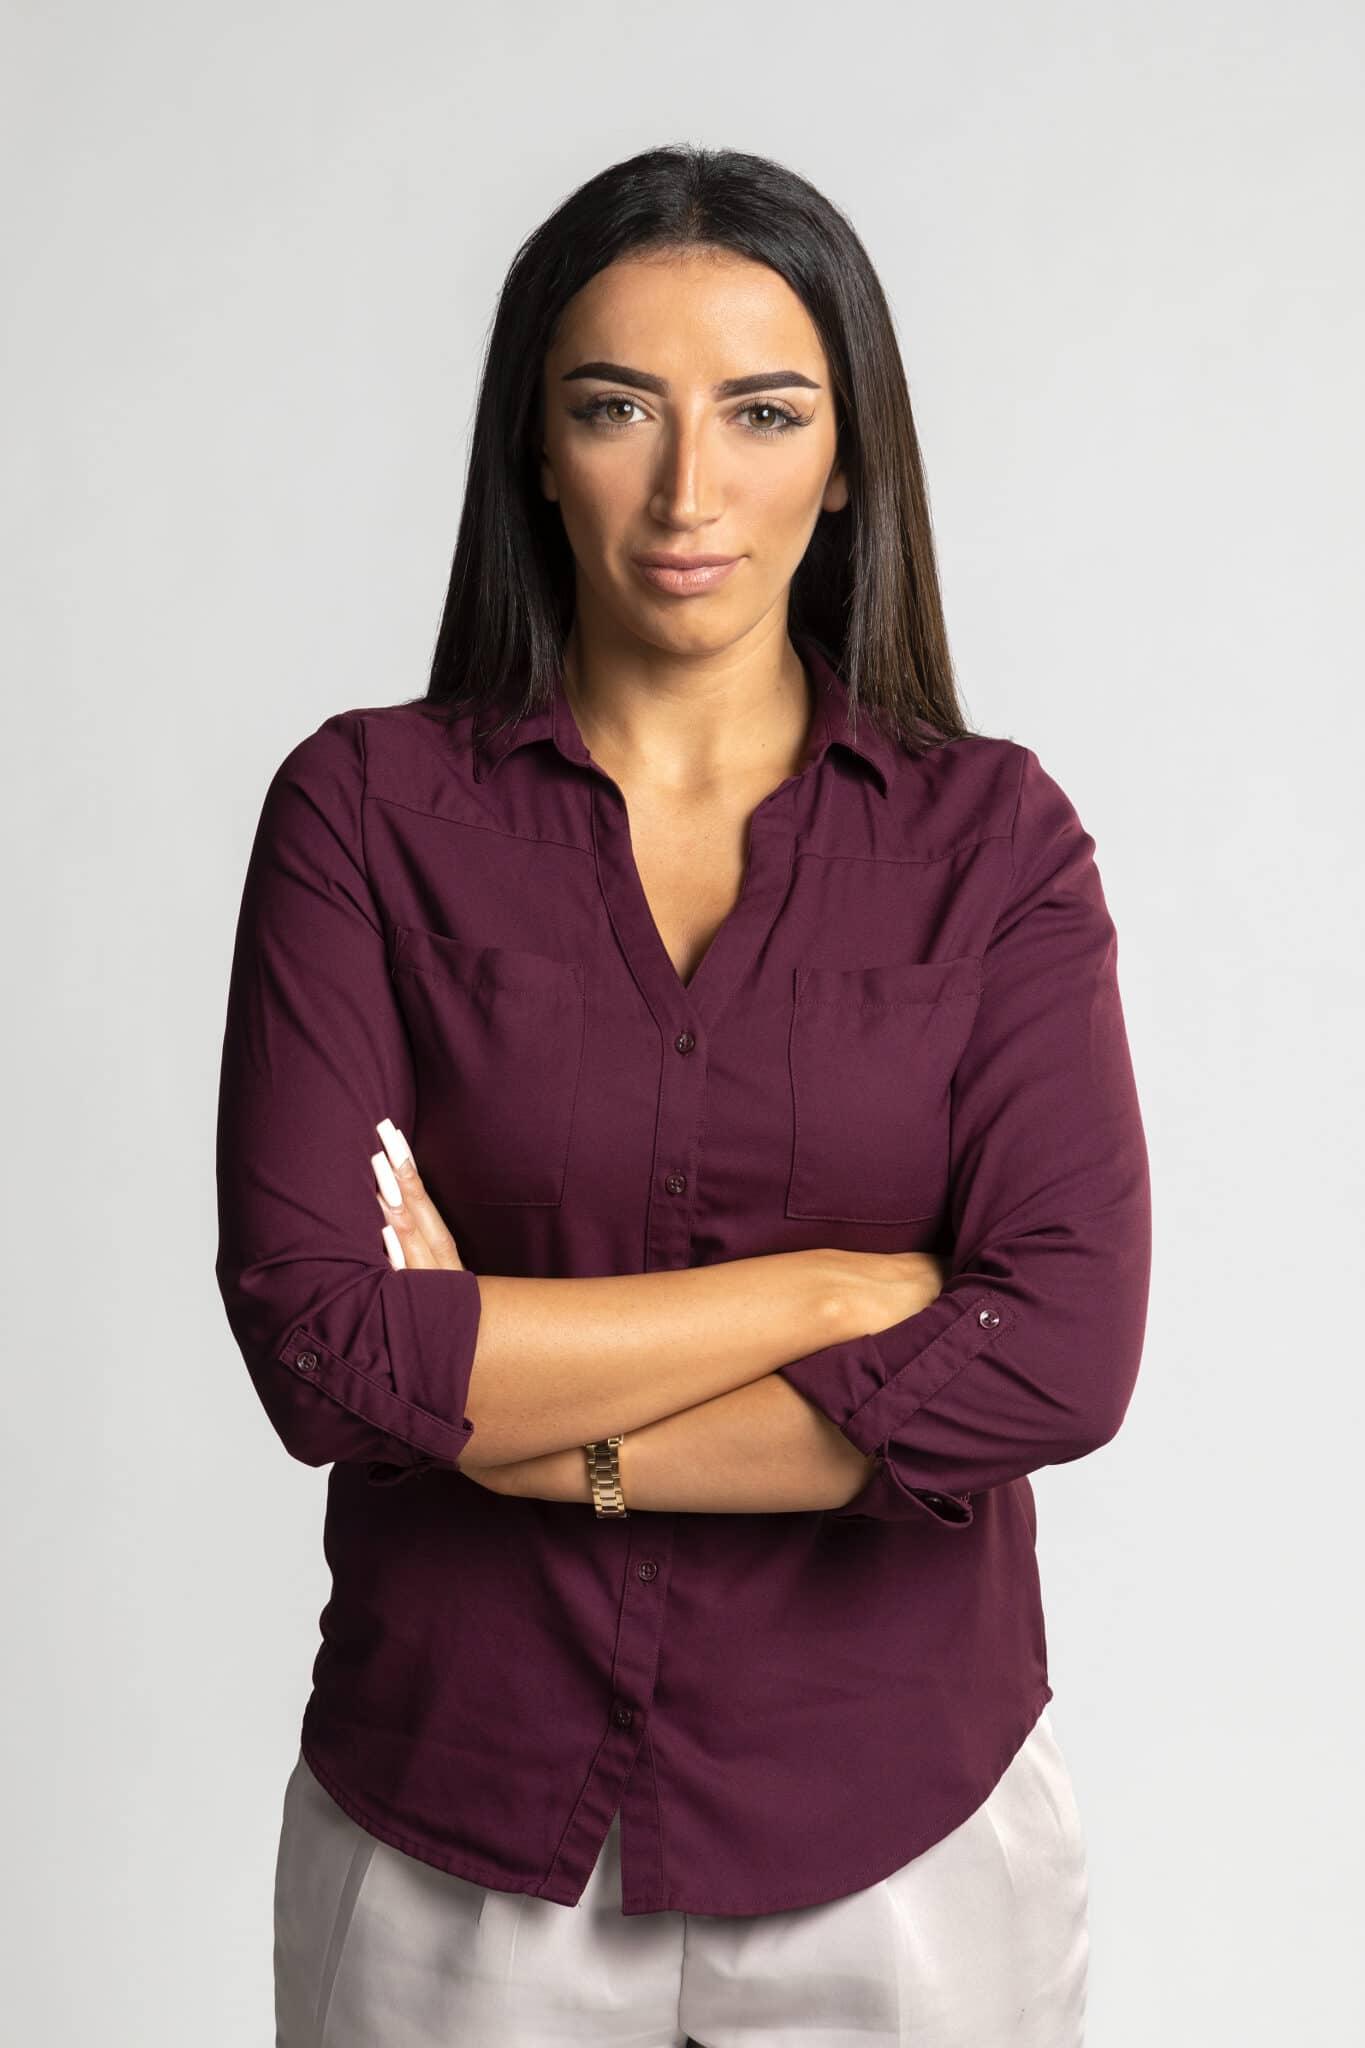 Selma Sarraj - Personalassistentin - Personal24 AG